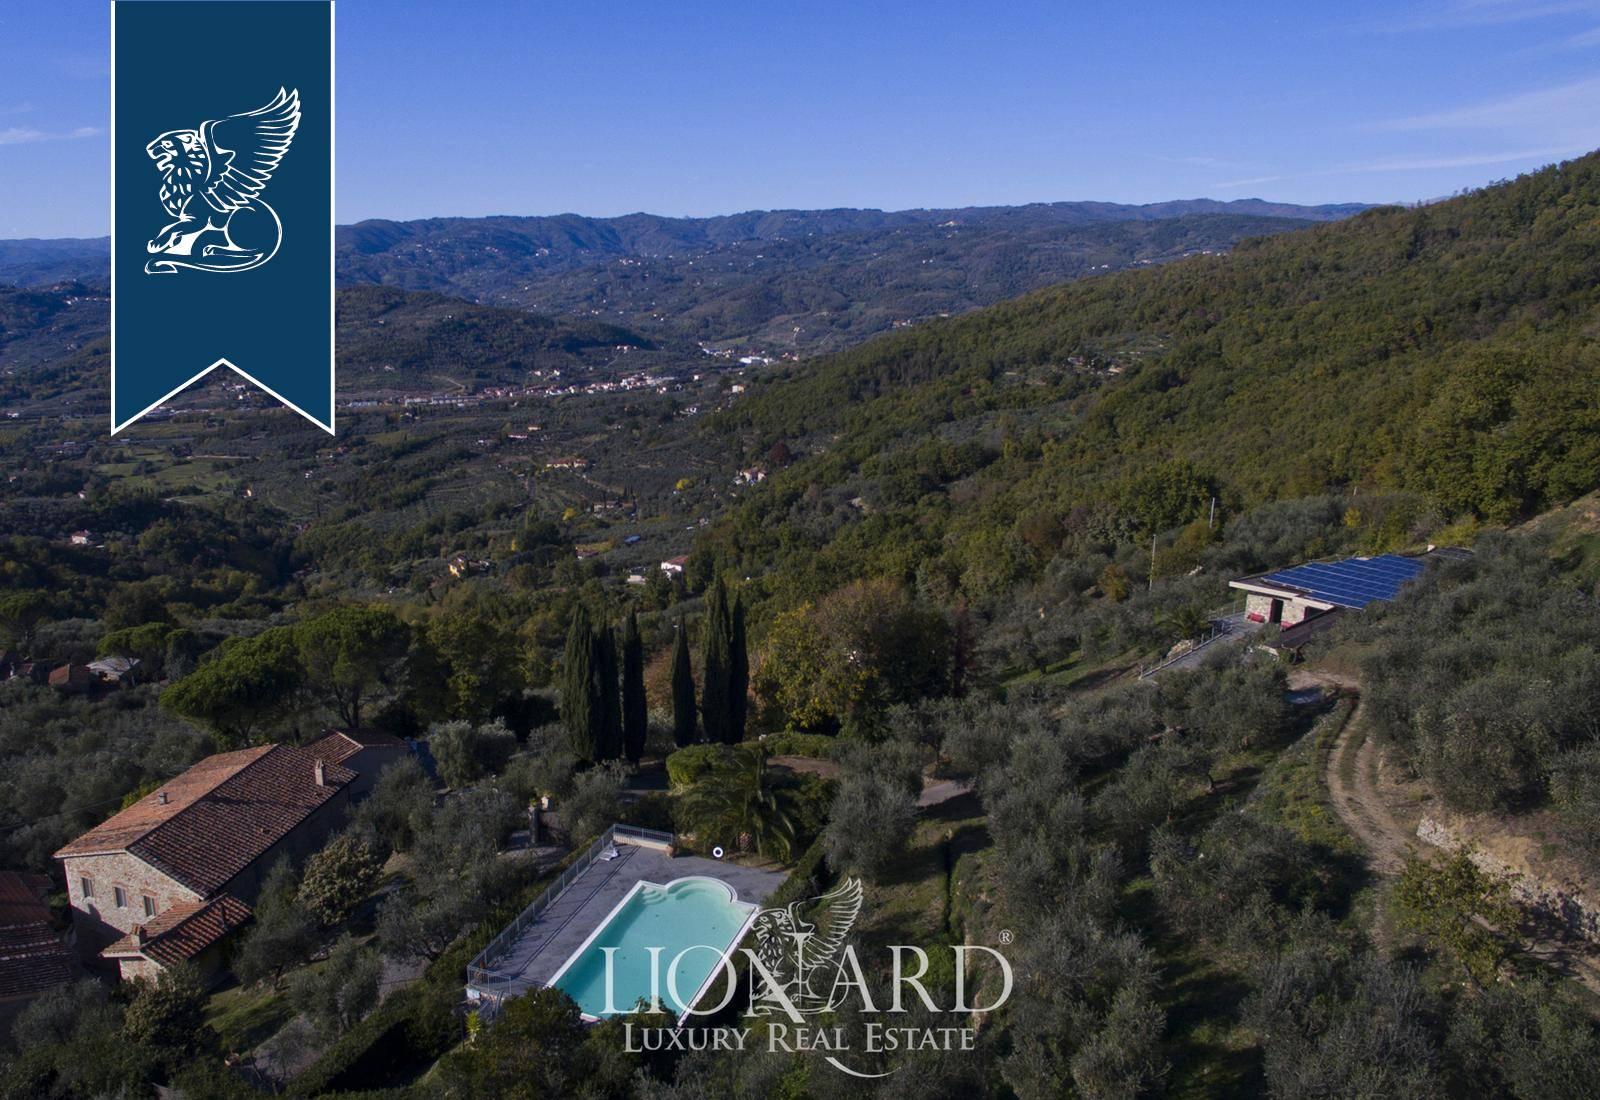 Agriturismo in Vendita a Monsummano Terme: 0 locali, 700 mq - Foto 3